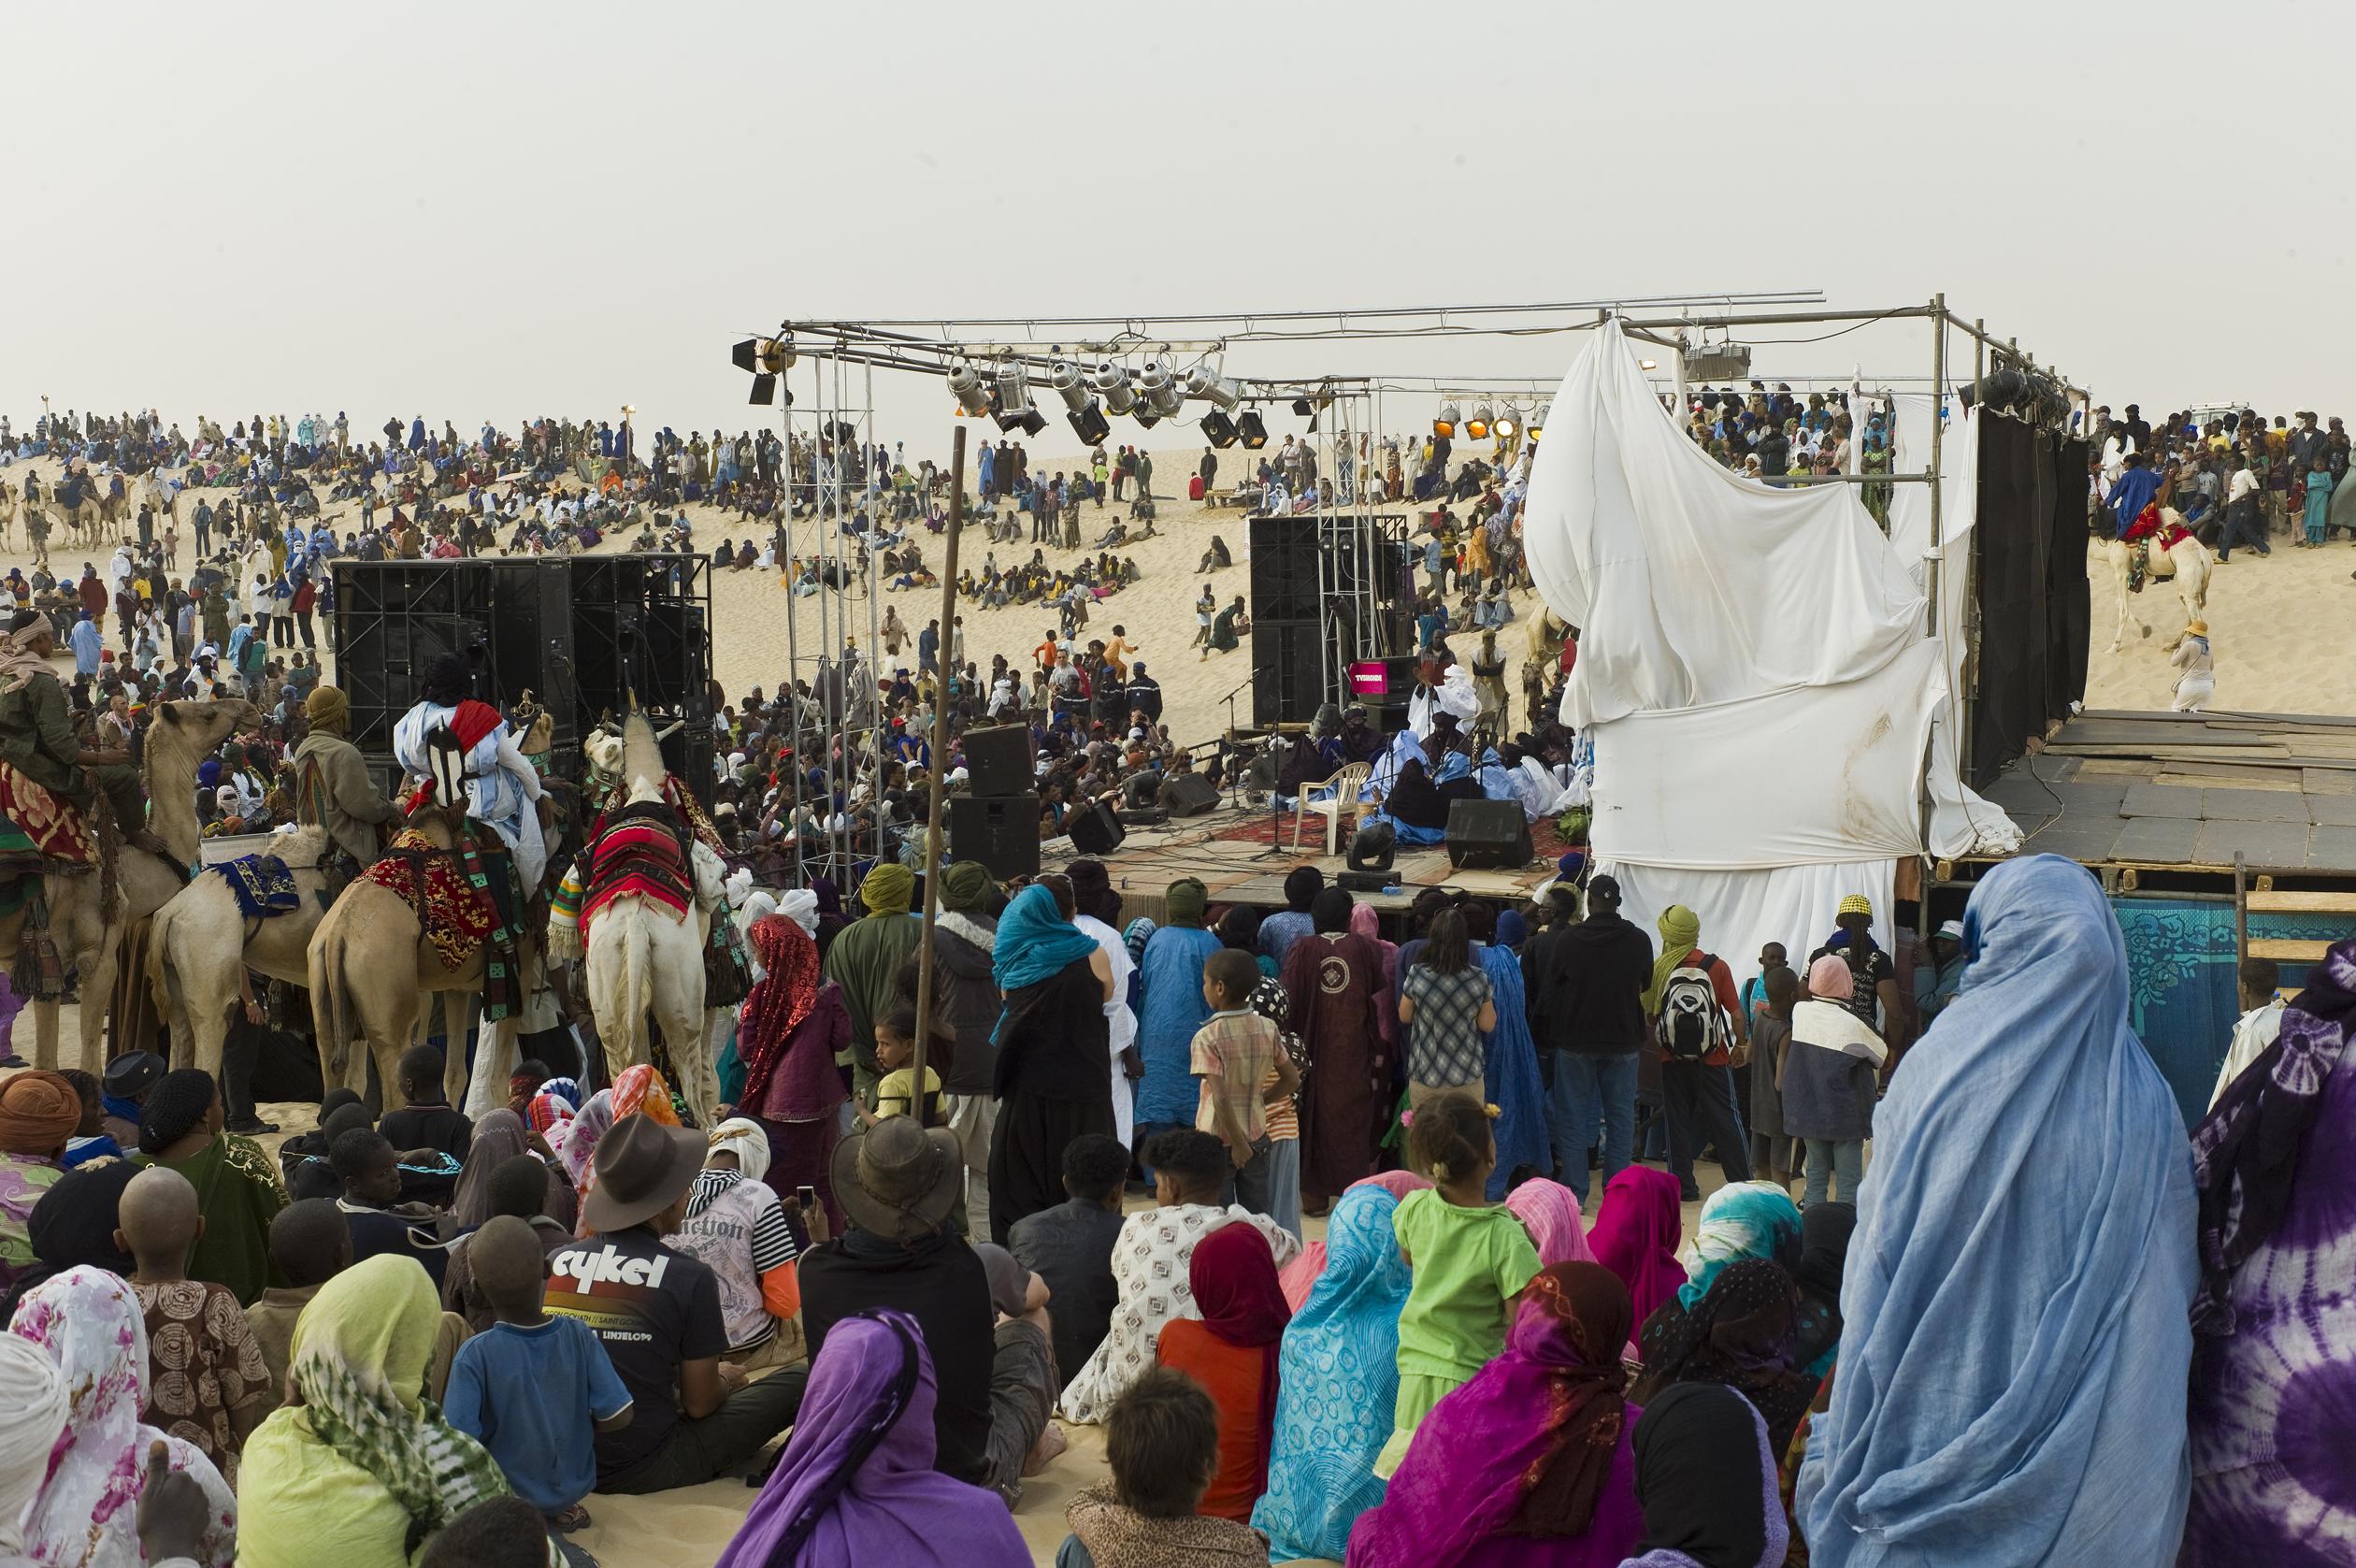 Audience_at_the_Festival_au_Desert_near_Timbuktu,_Mali_2012